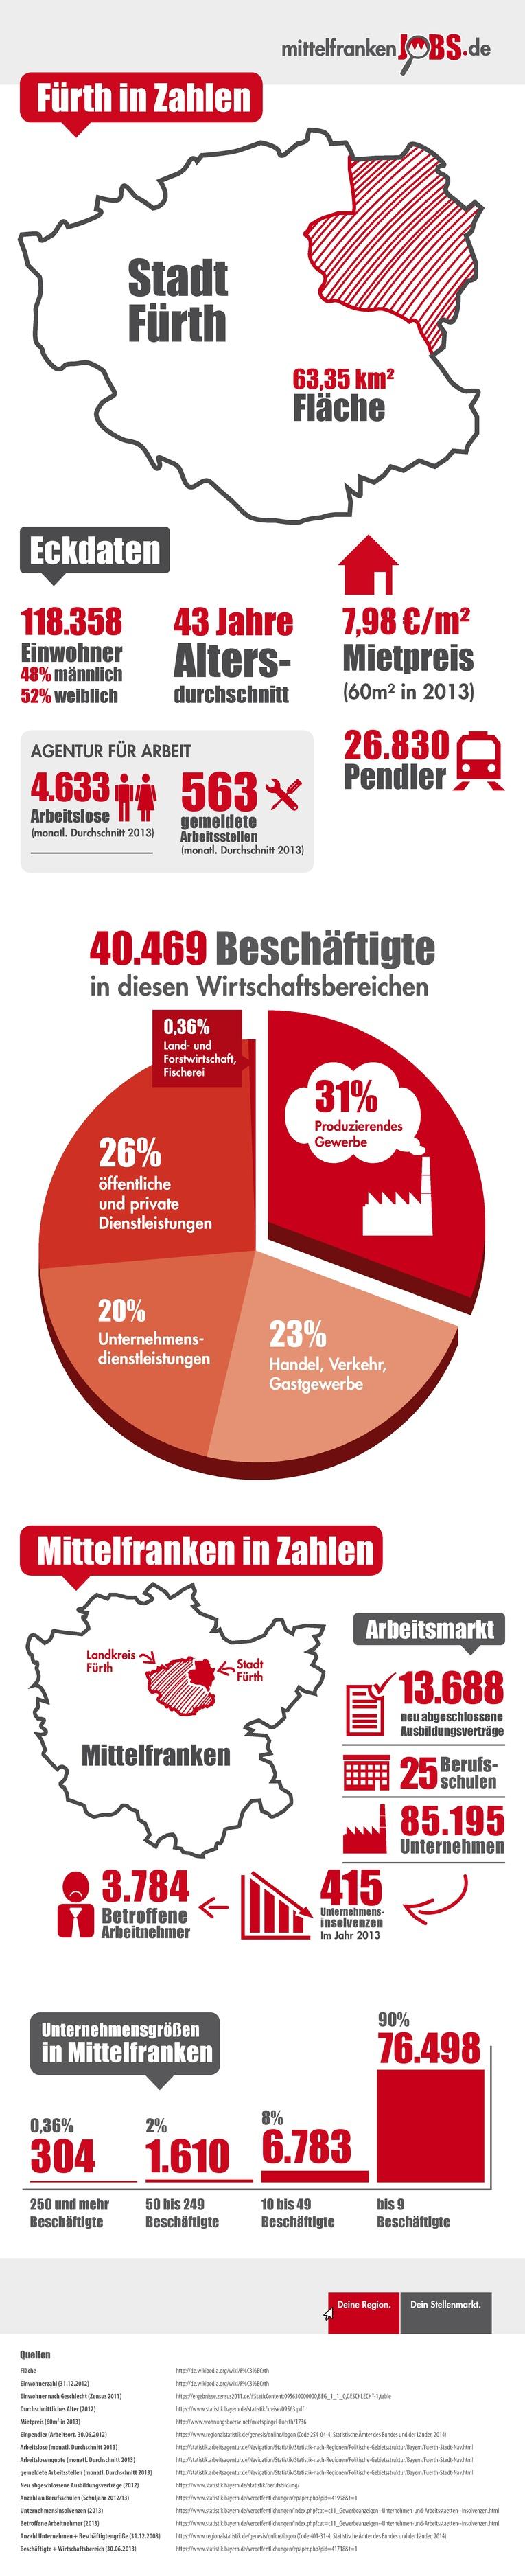 Infografik Fürth